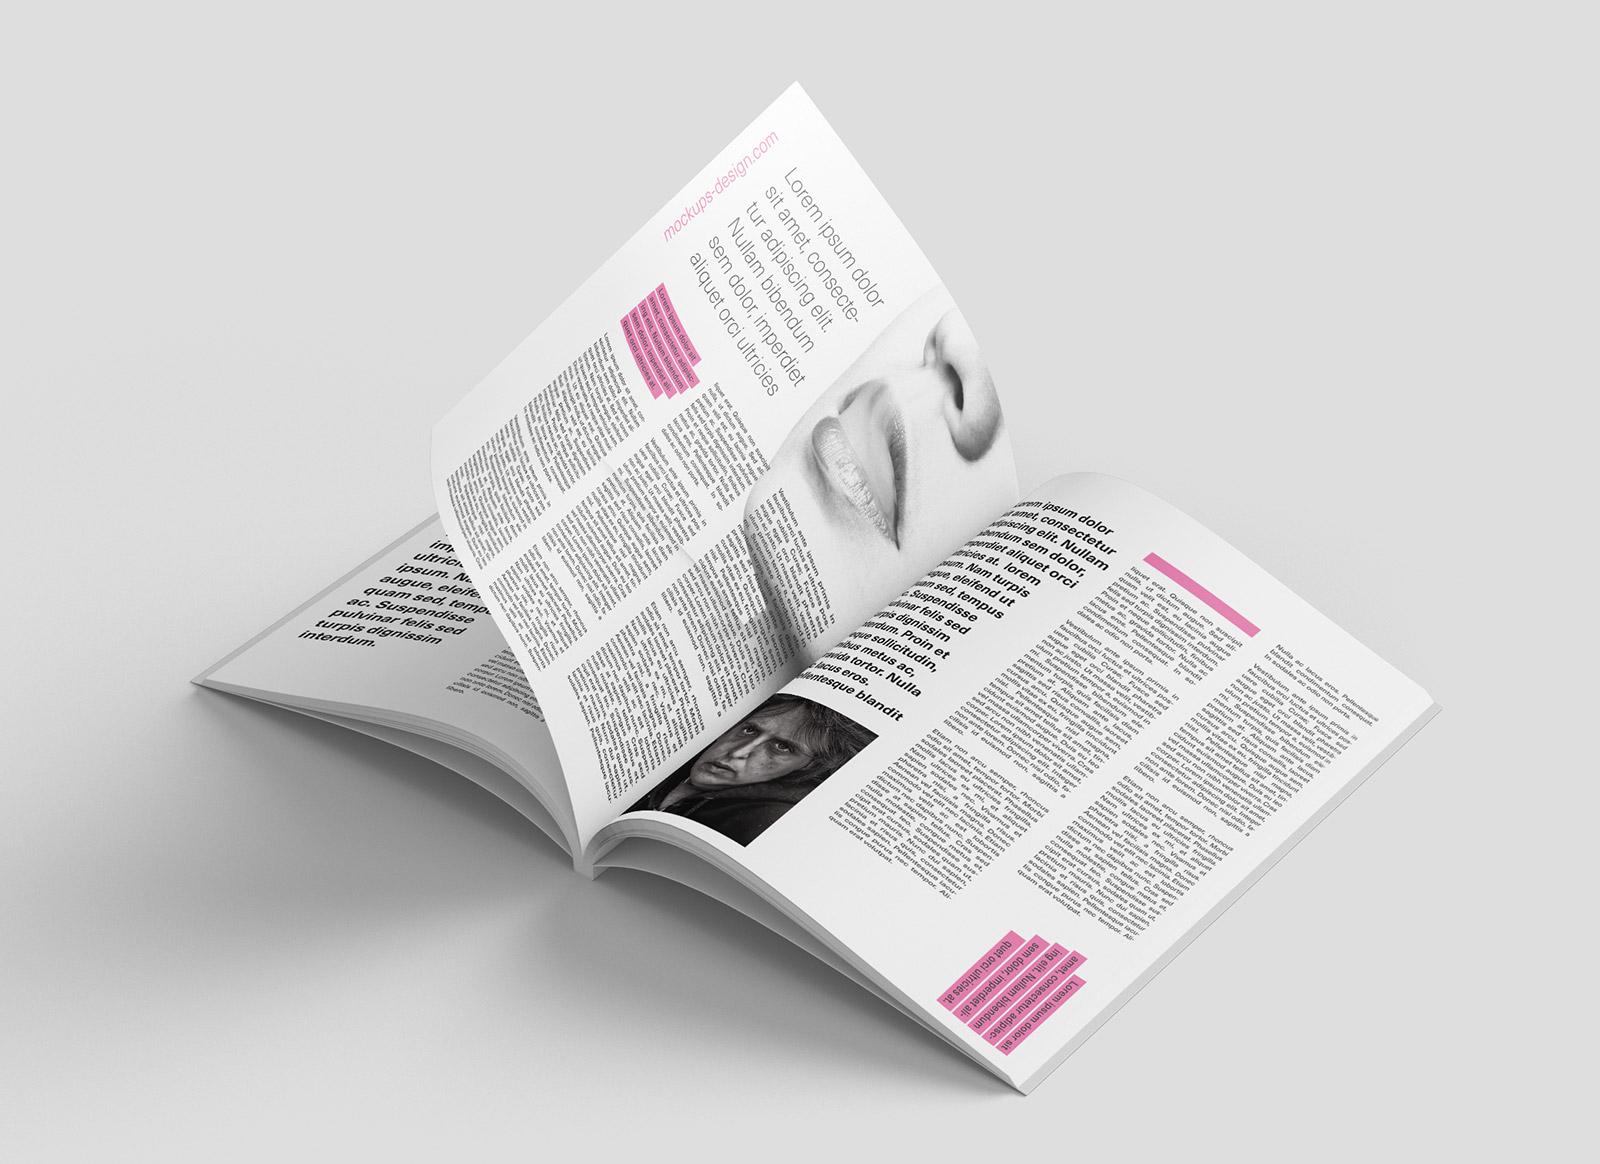 free-premium-magazine-mockup-psd (6)